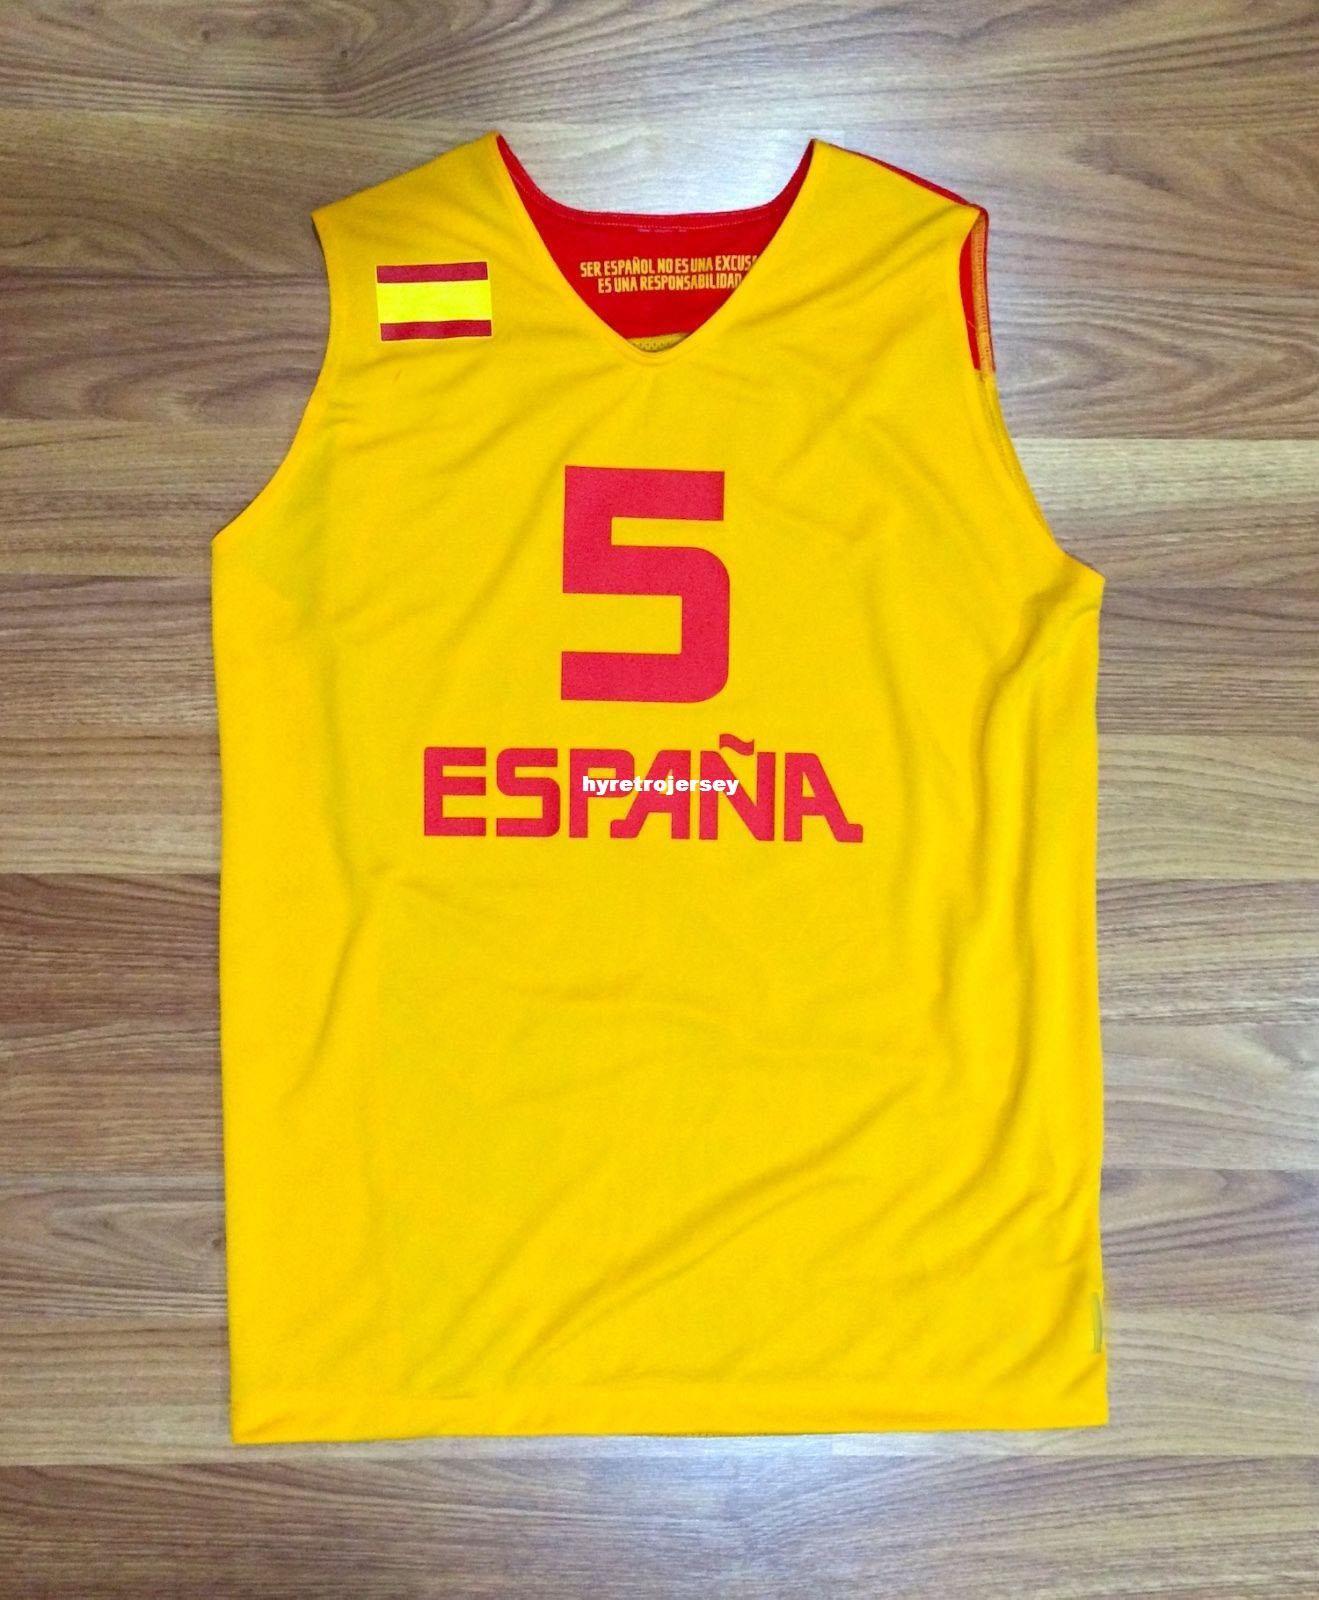 Cheap Wholesale Rudy Fernandez Spain Basketball Game Jersey Eurobasket Fiba Top T Shirt Vest Stitched Basketball Jerseys